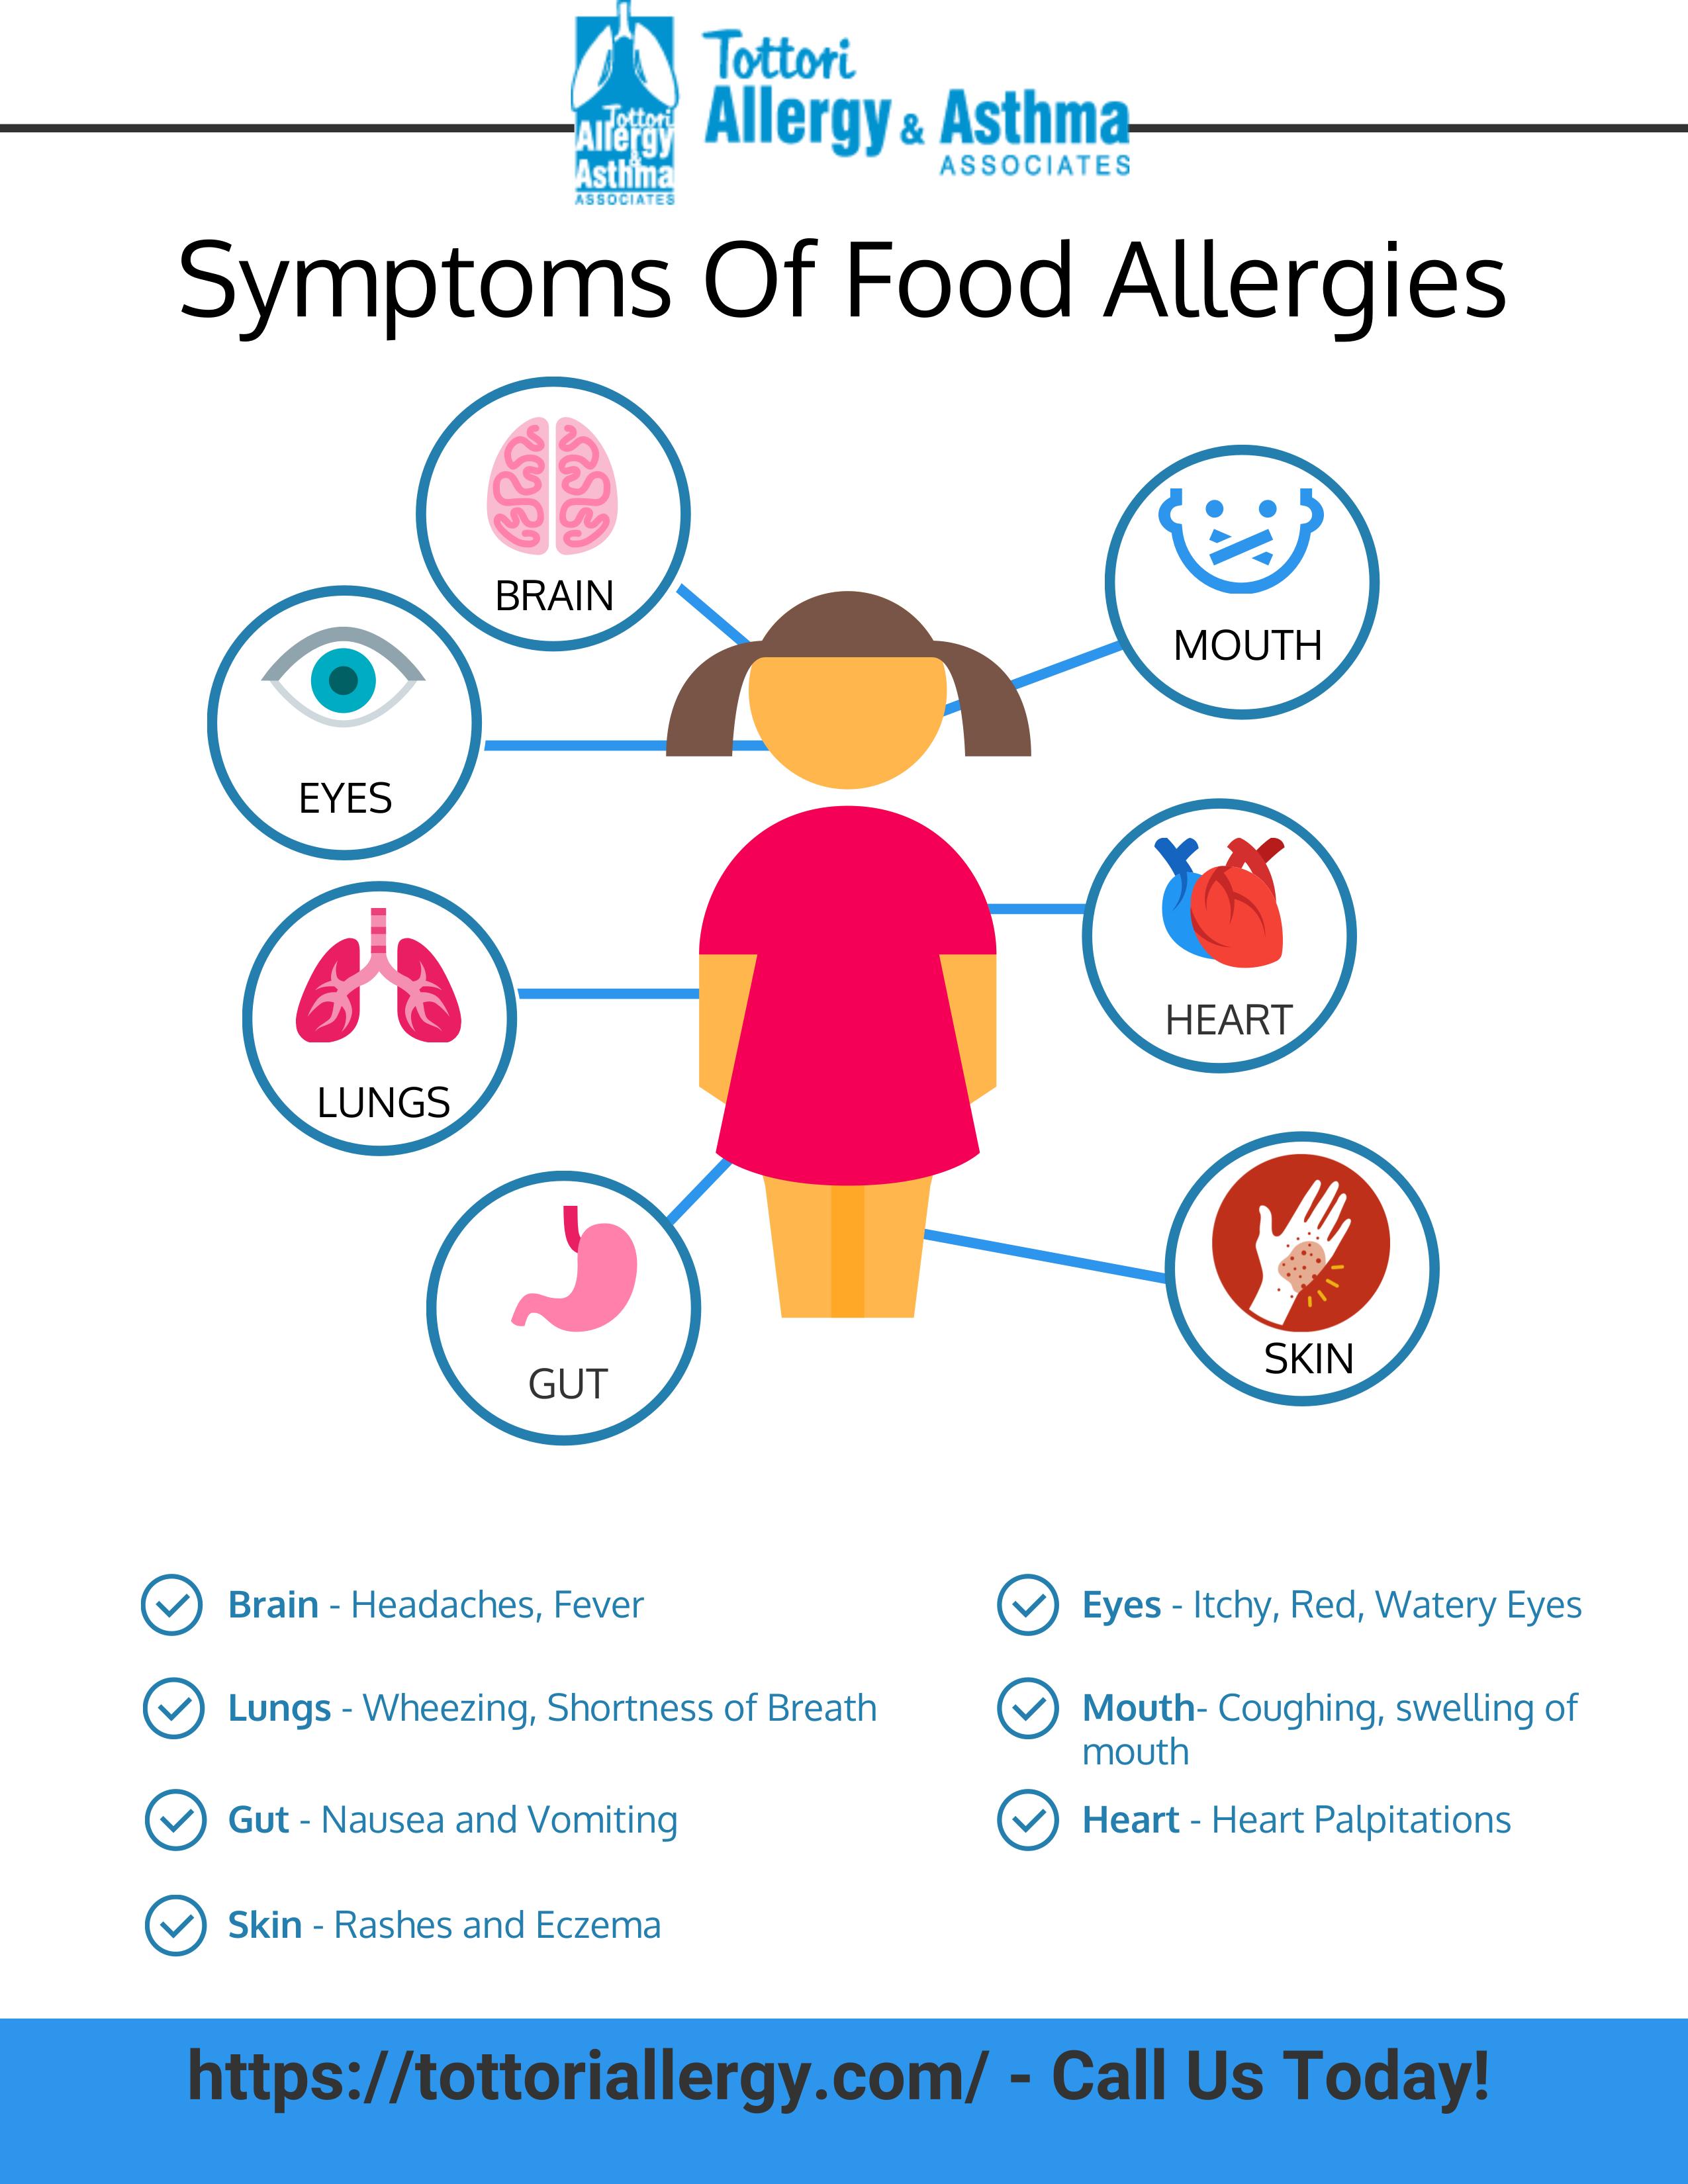 Symptoms Of Food Allergies Tottori Allergy Asthma Associates Allergy Asthma Asthma Allergies